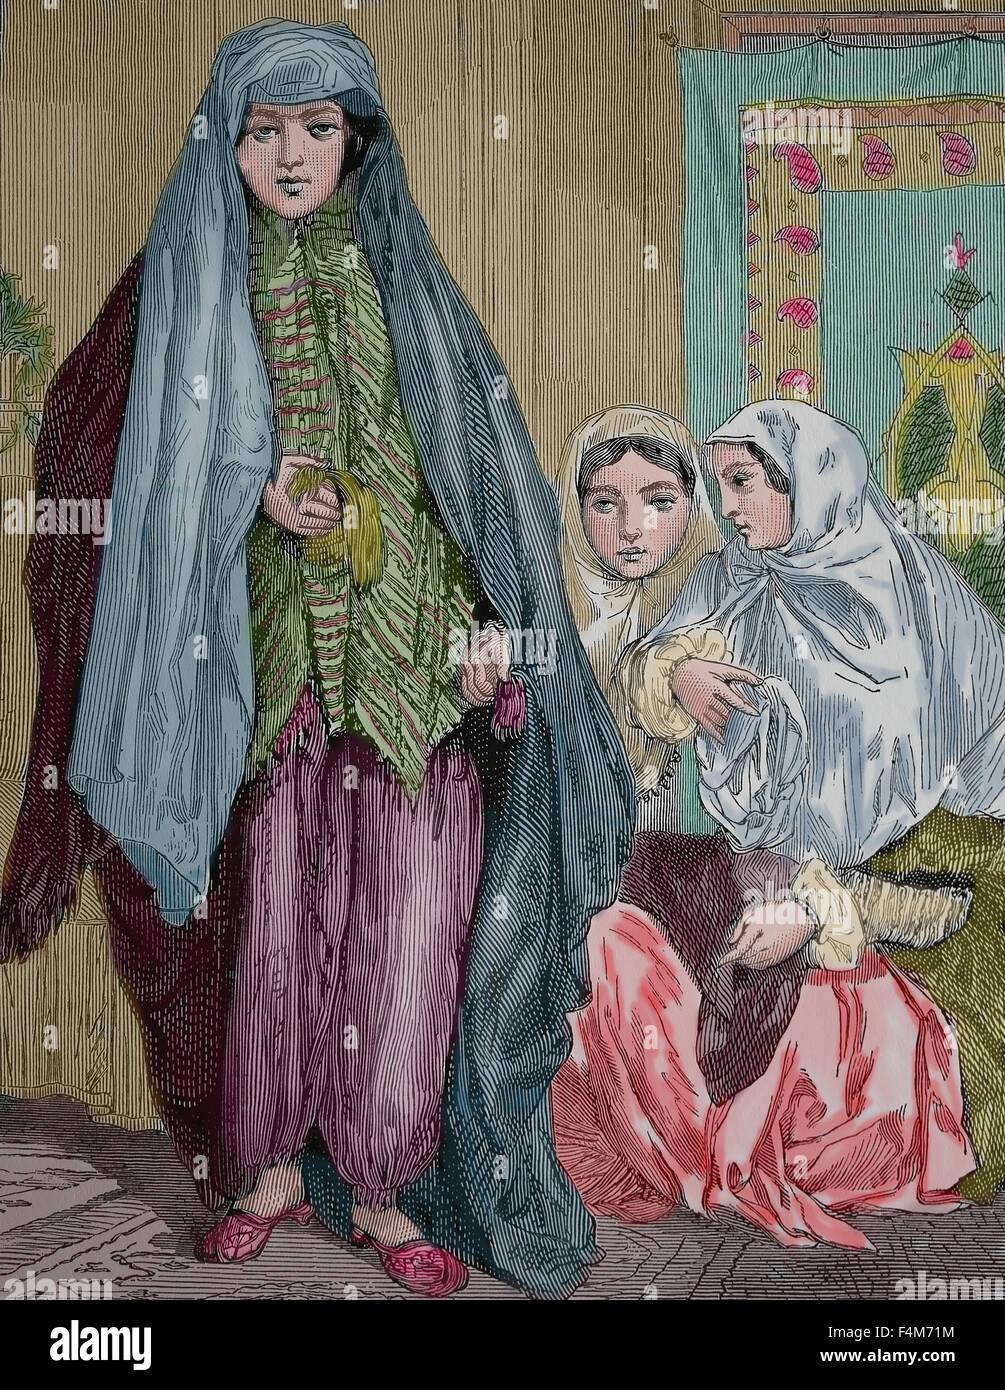 Asia. Persia. Persian ladies, 1880. Engraving, 19th century. Color. - Stock Image